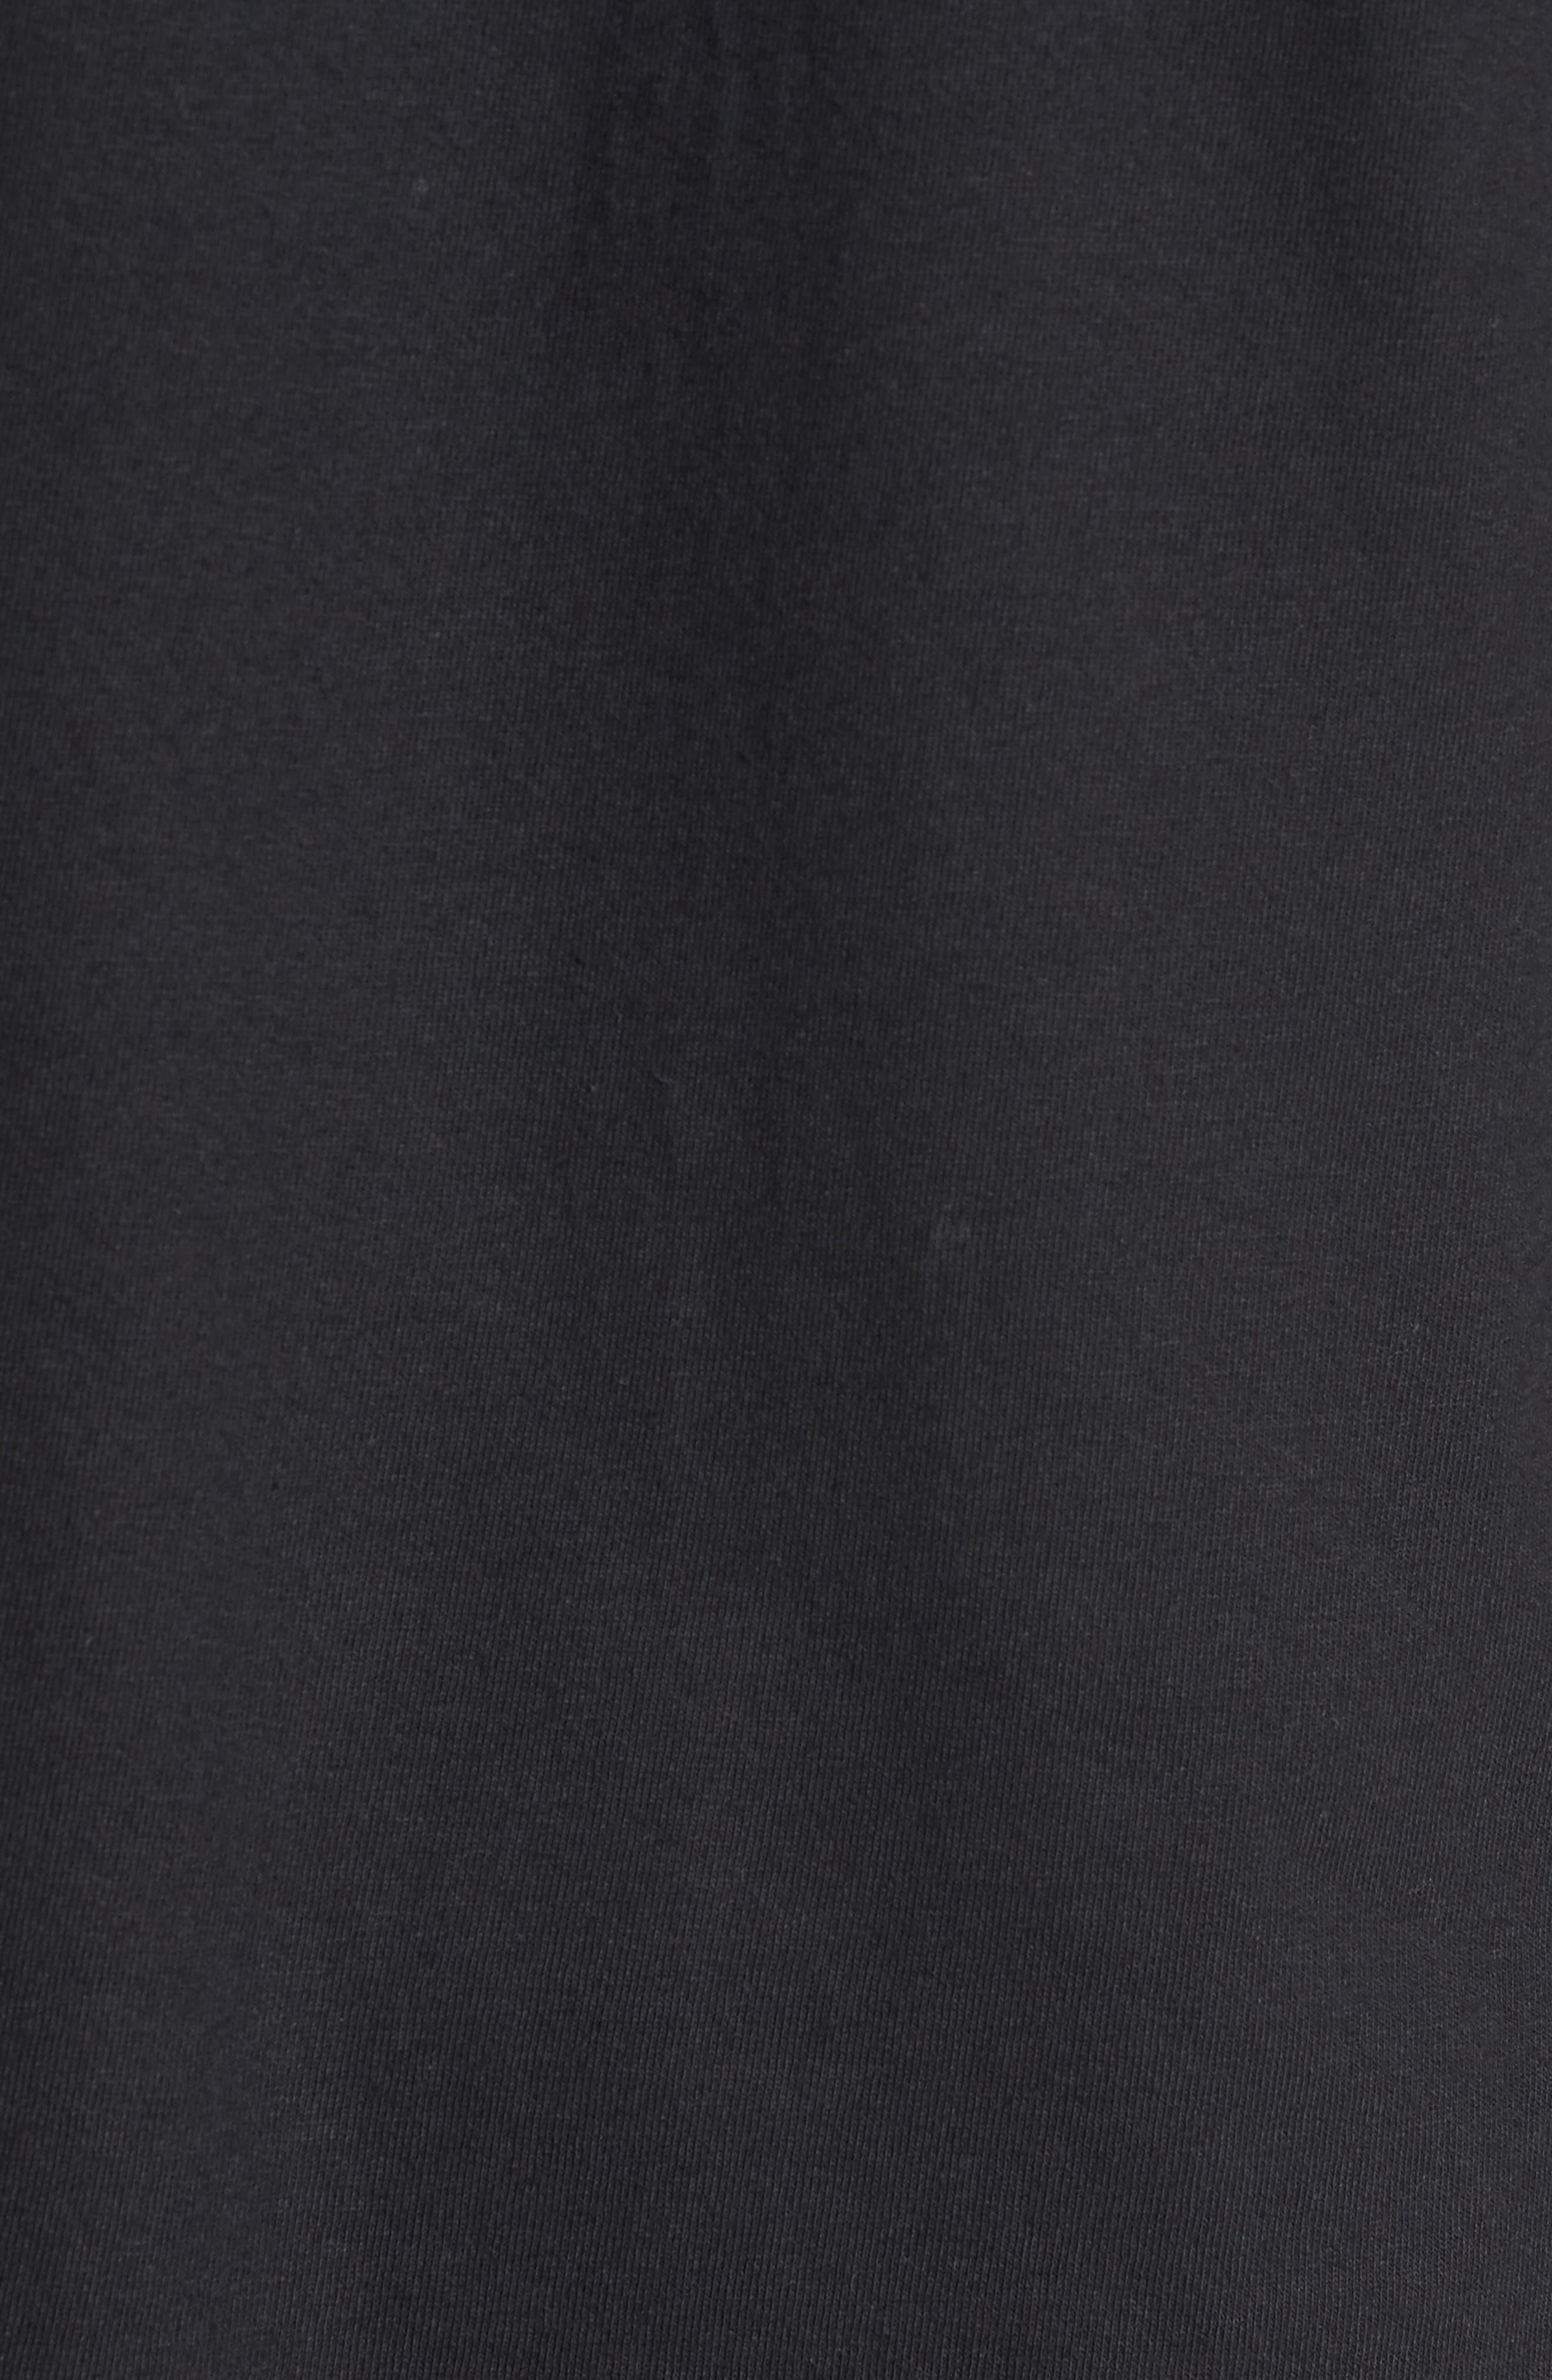 Ice Cube T-Shirt,                             Alternate thumbnail 5, color,